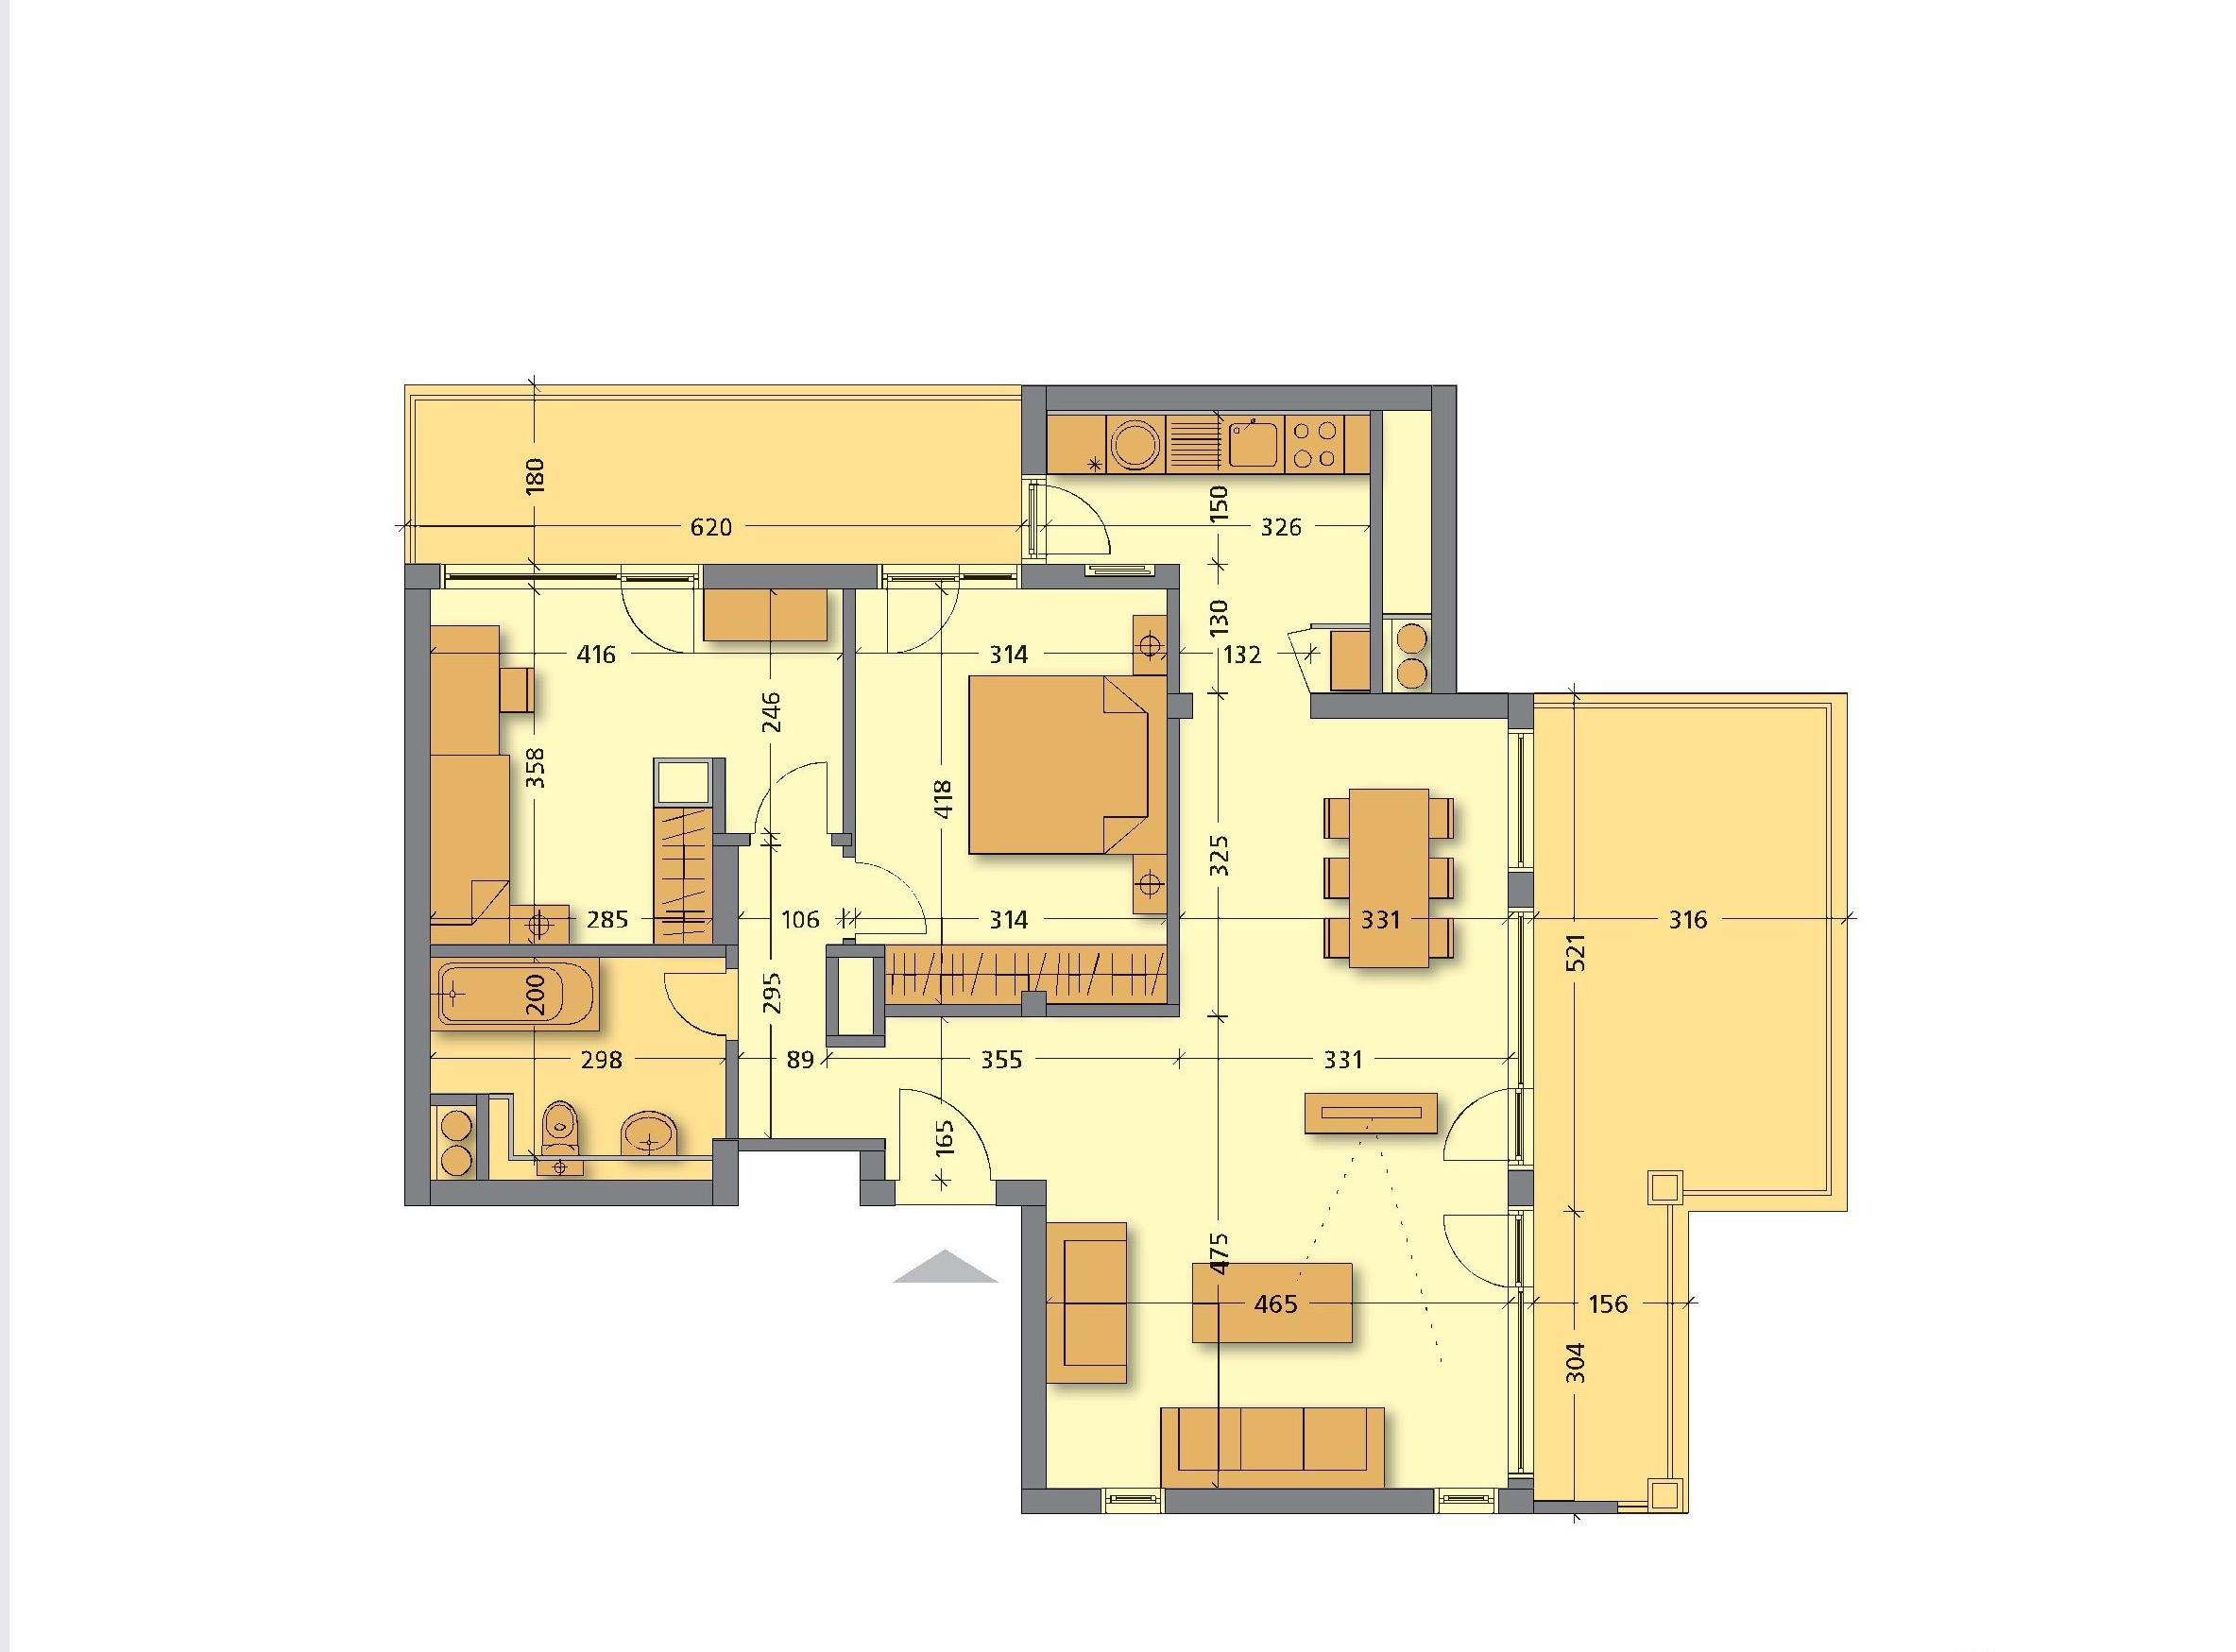 Floor Plans Of Two Bedroom Apartment In Vitosha Tulip